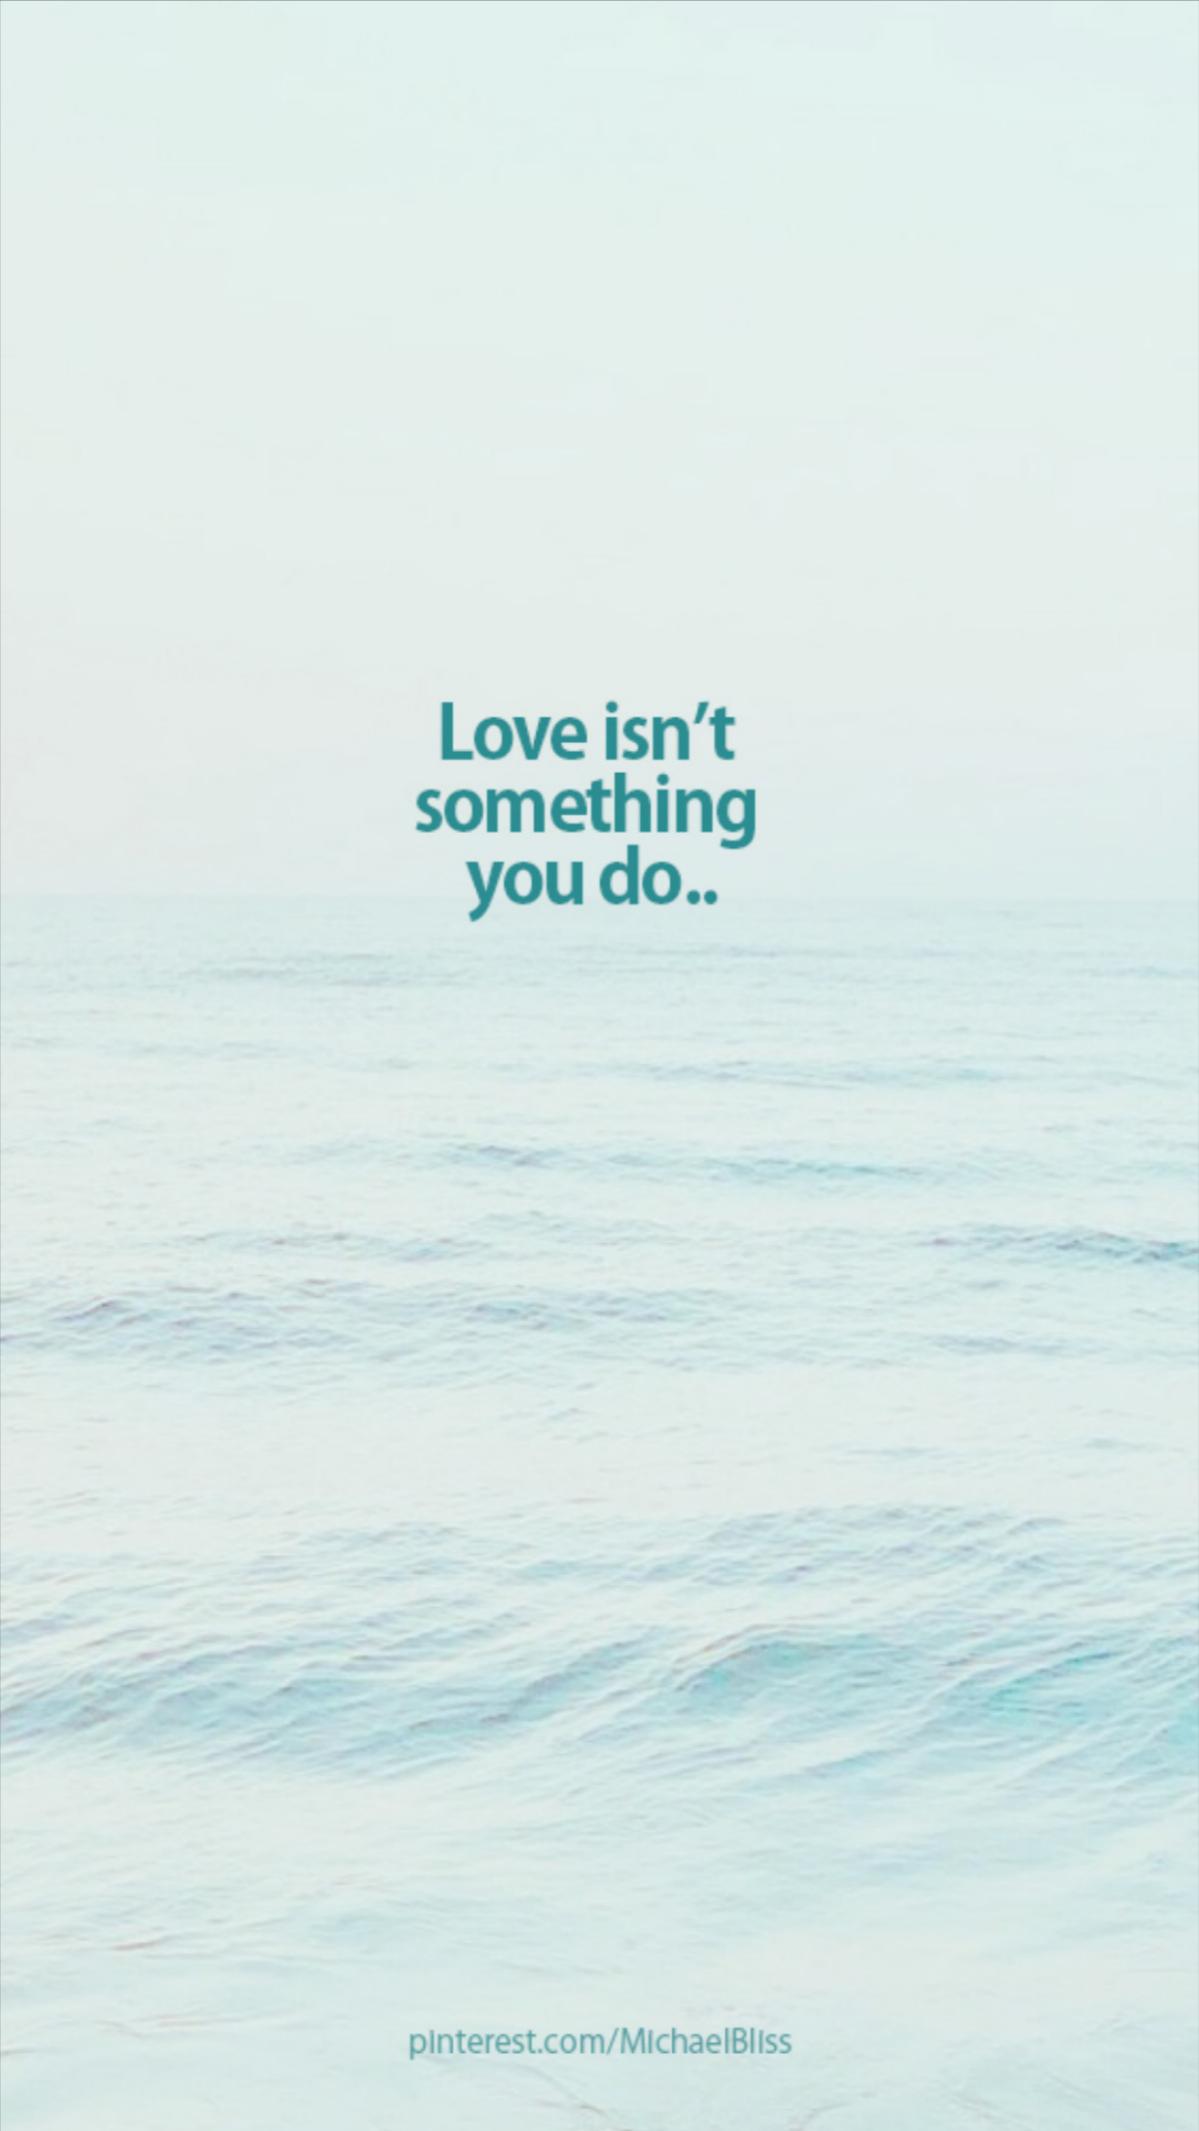 Love isn't something you do